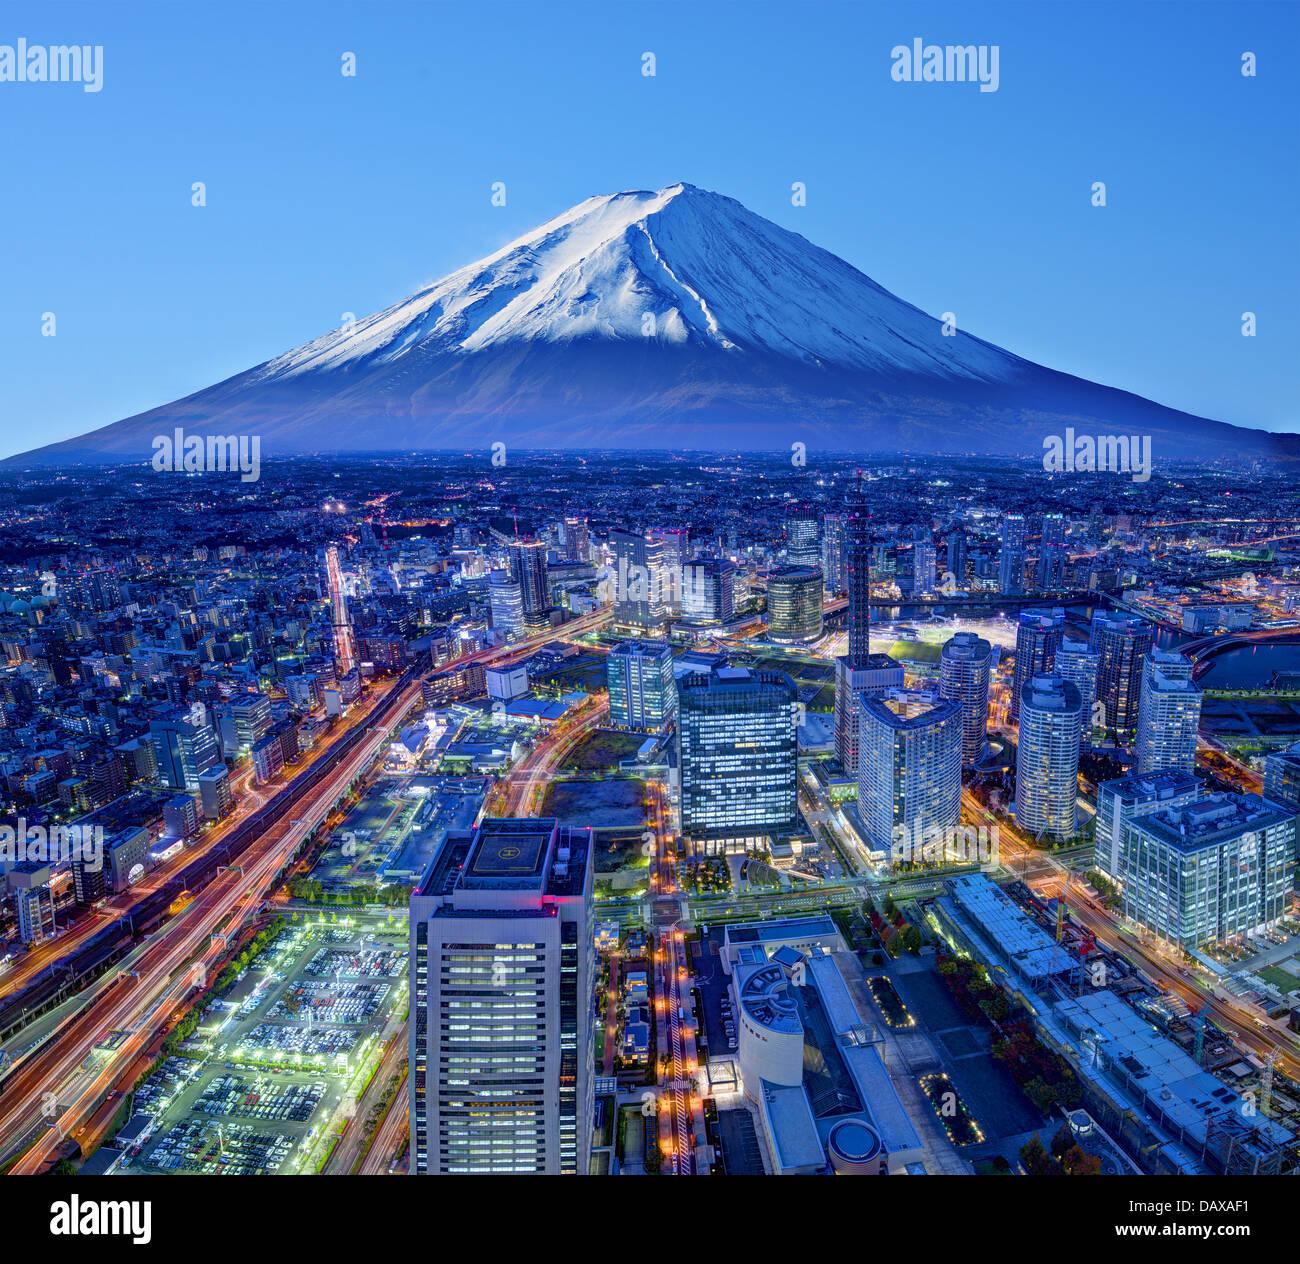 Skyline von Mt. Fuji und Yokohama, Japan. Stockbild